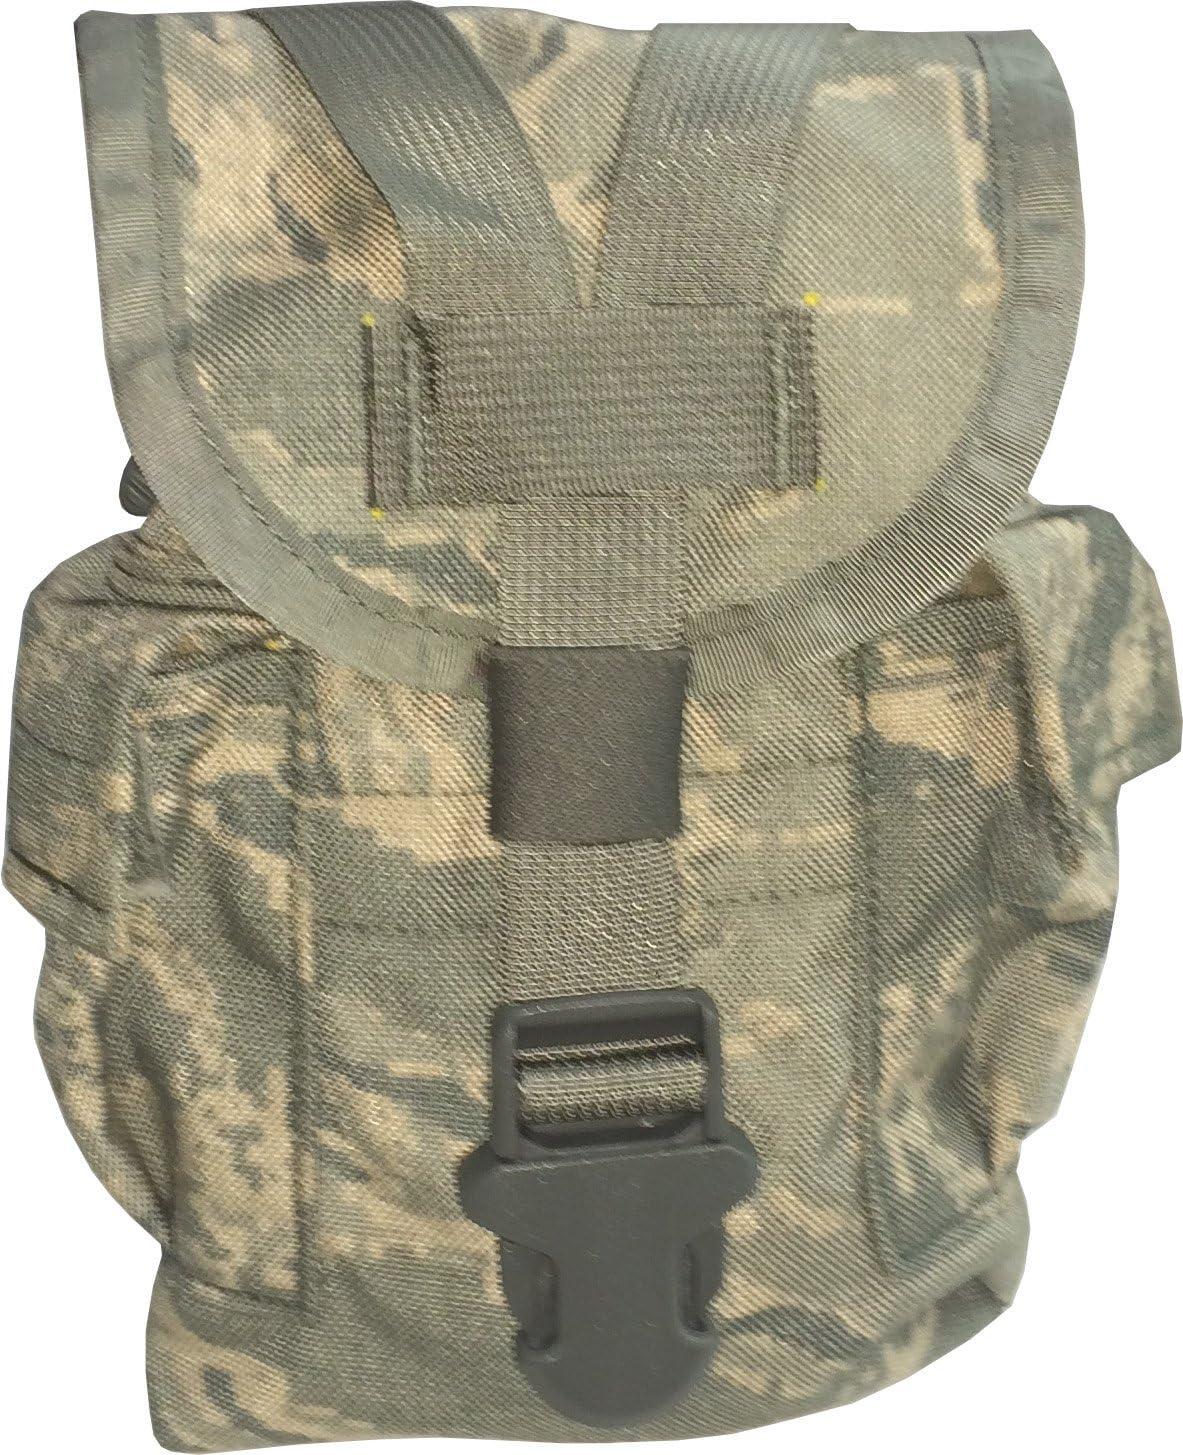 US Army 1 Quart Canteen Molle Dcu Desert Pouch Feldflaschentasche Tasche